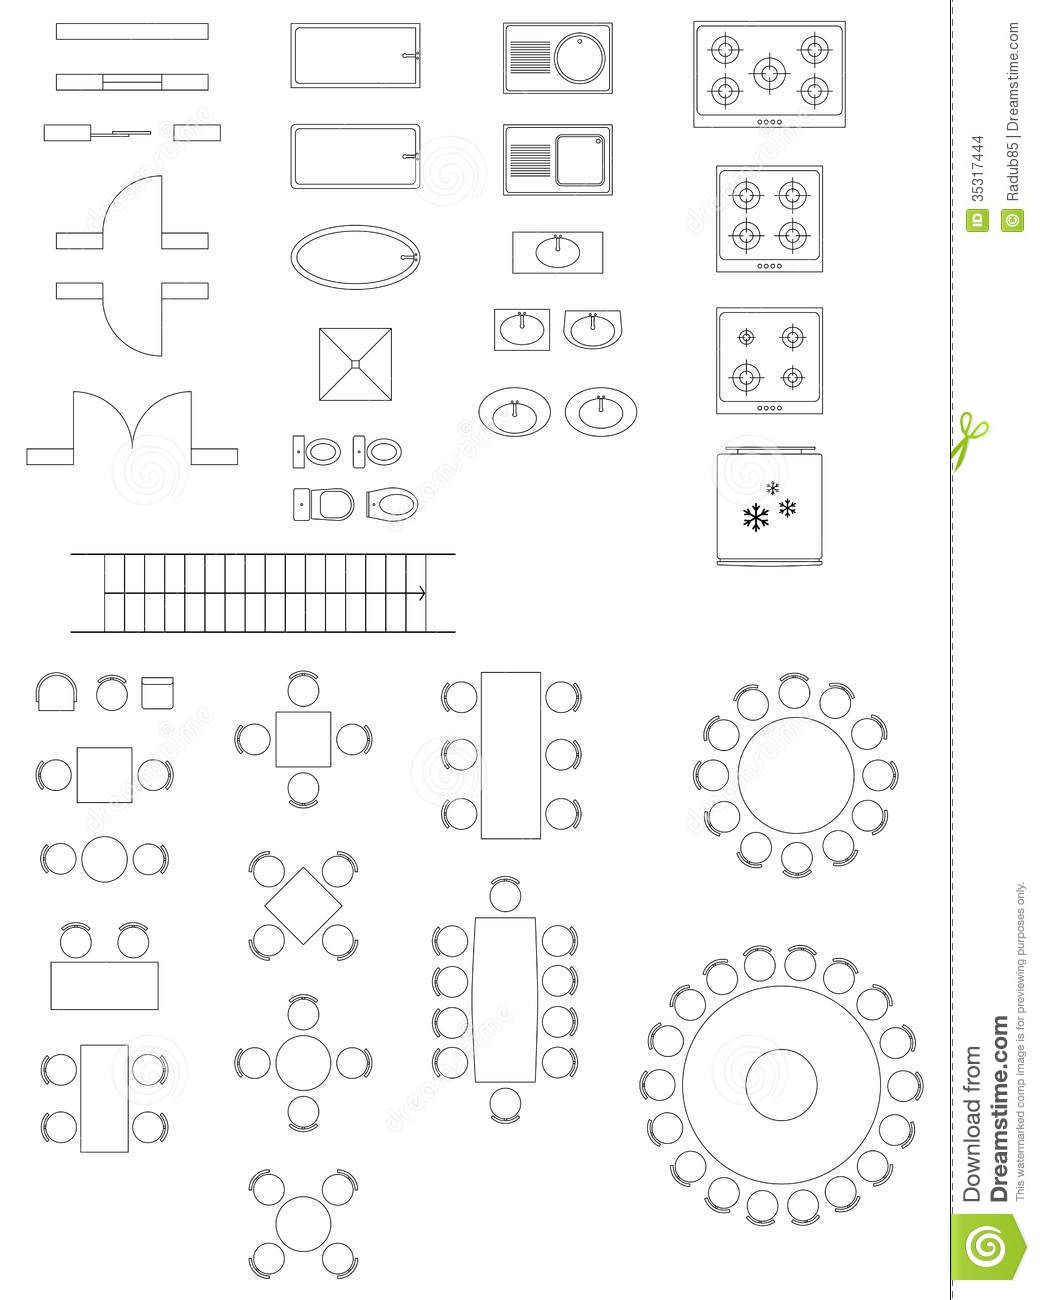 standard architectural symbols